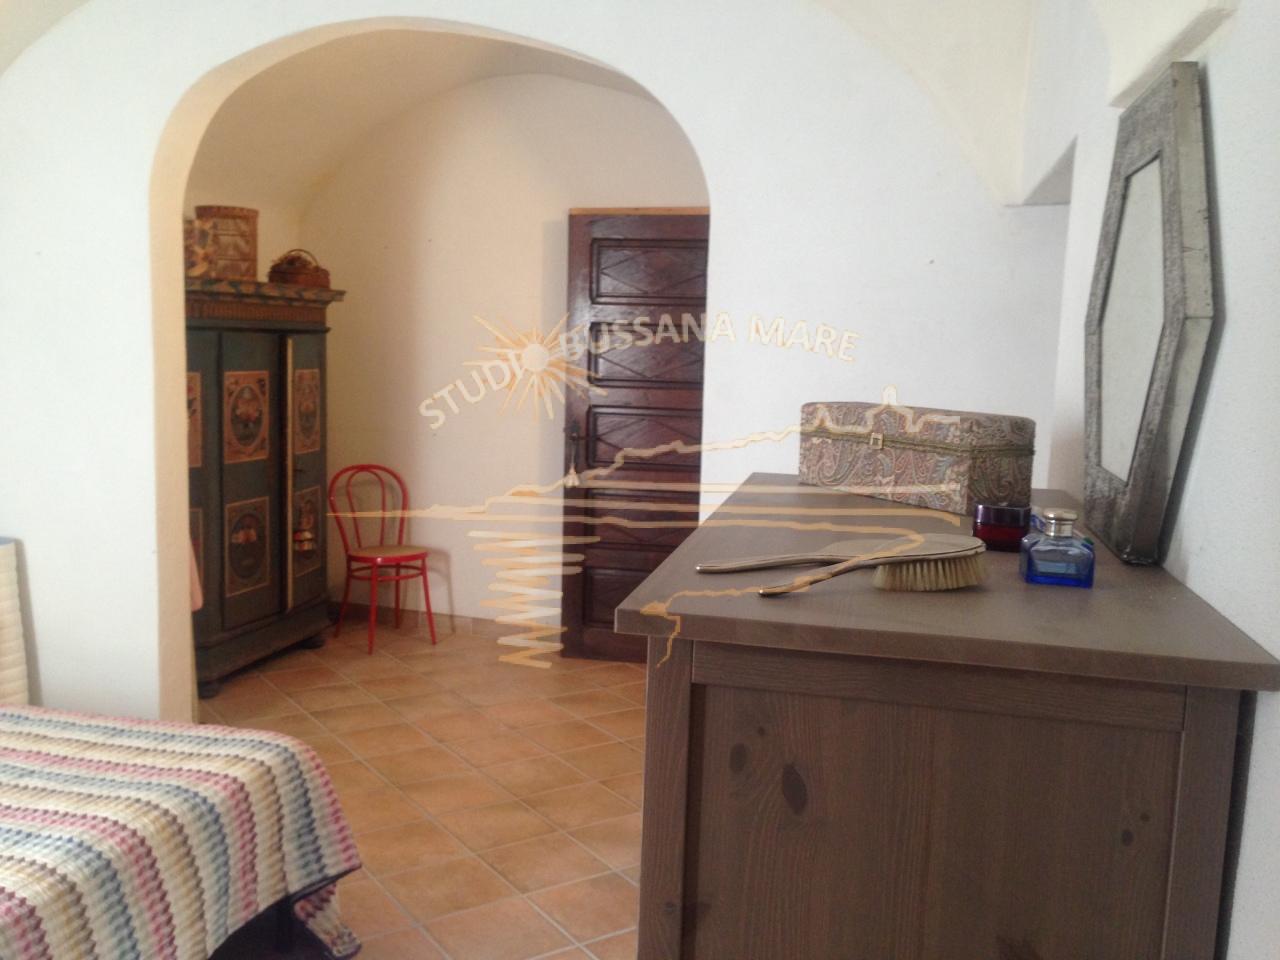 Bilocale Badalucco Via Vezzargo 12